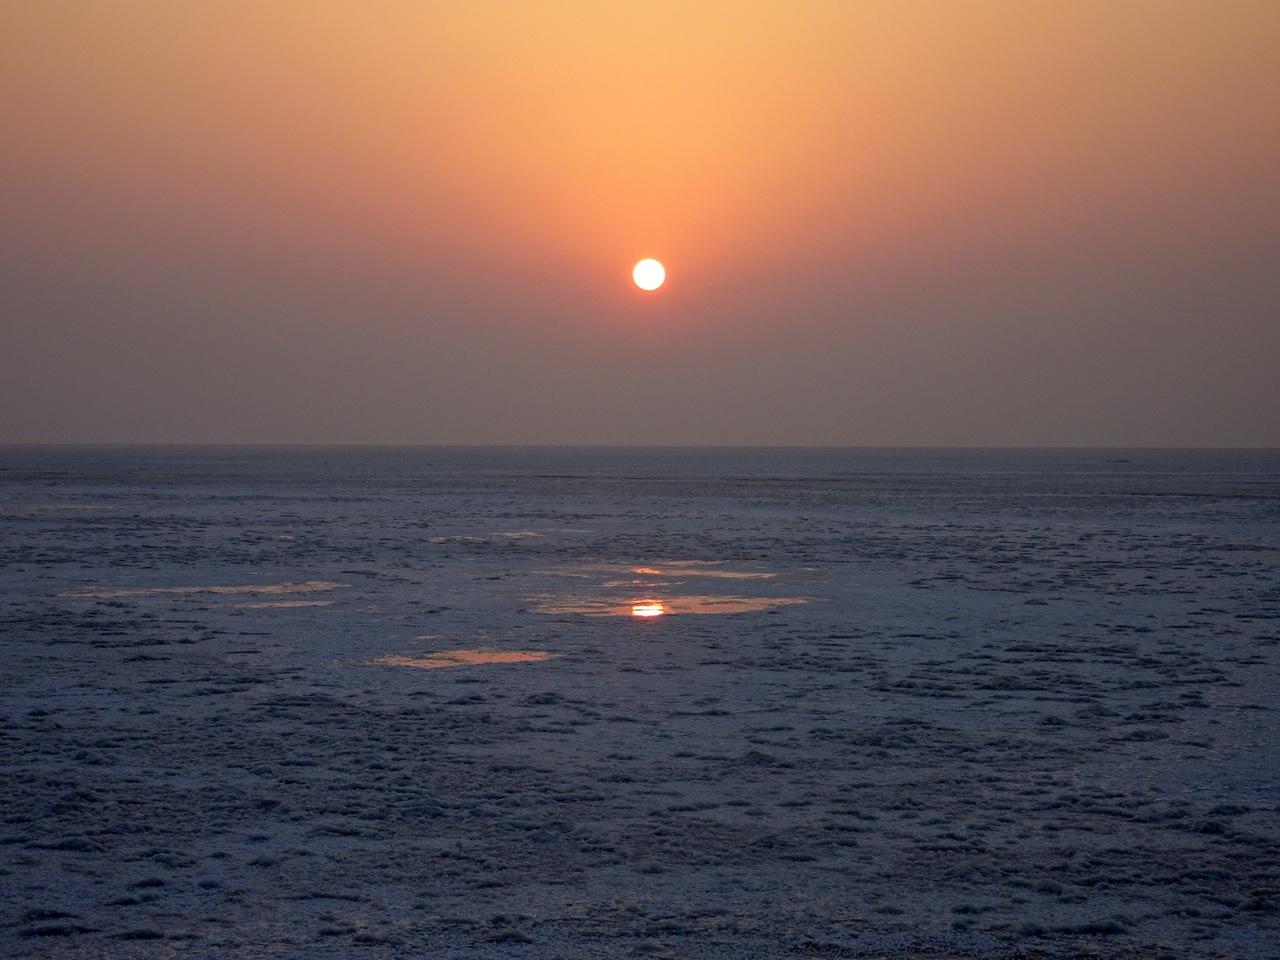 SunRise at Rann of Kutch